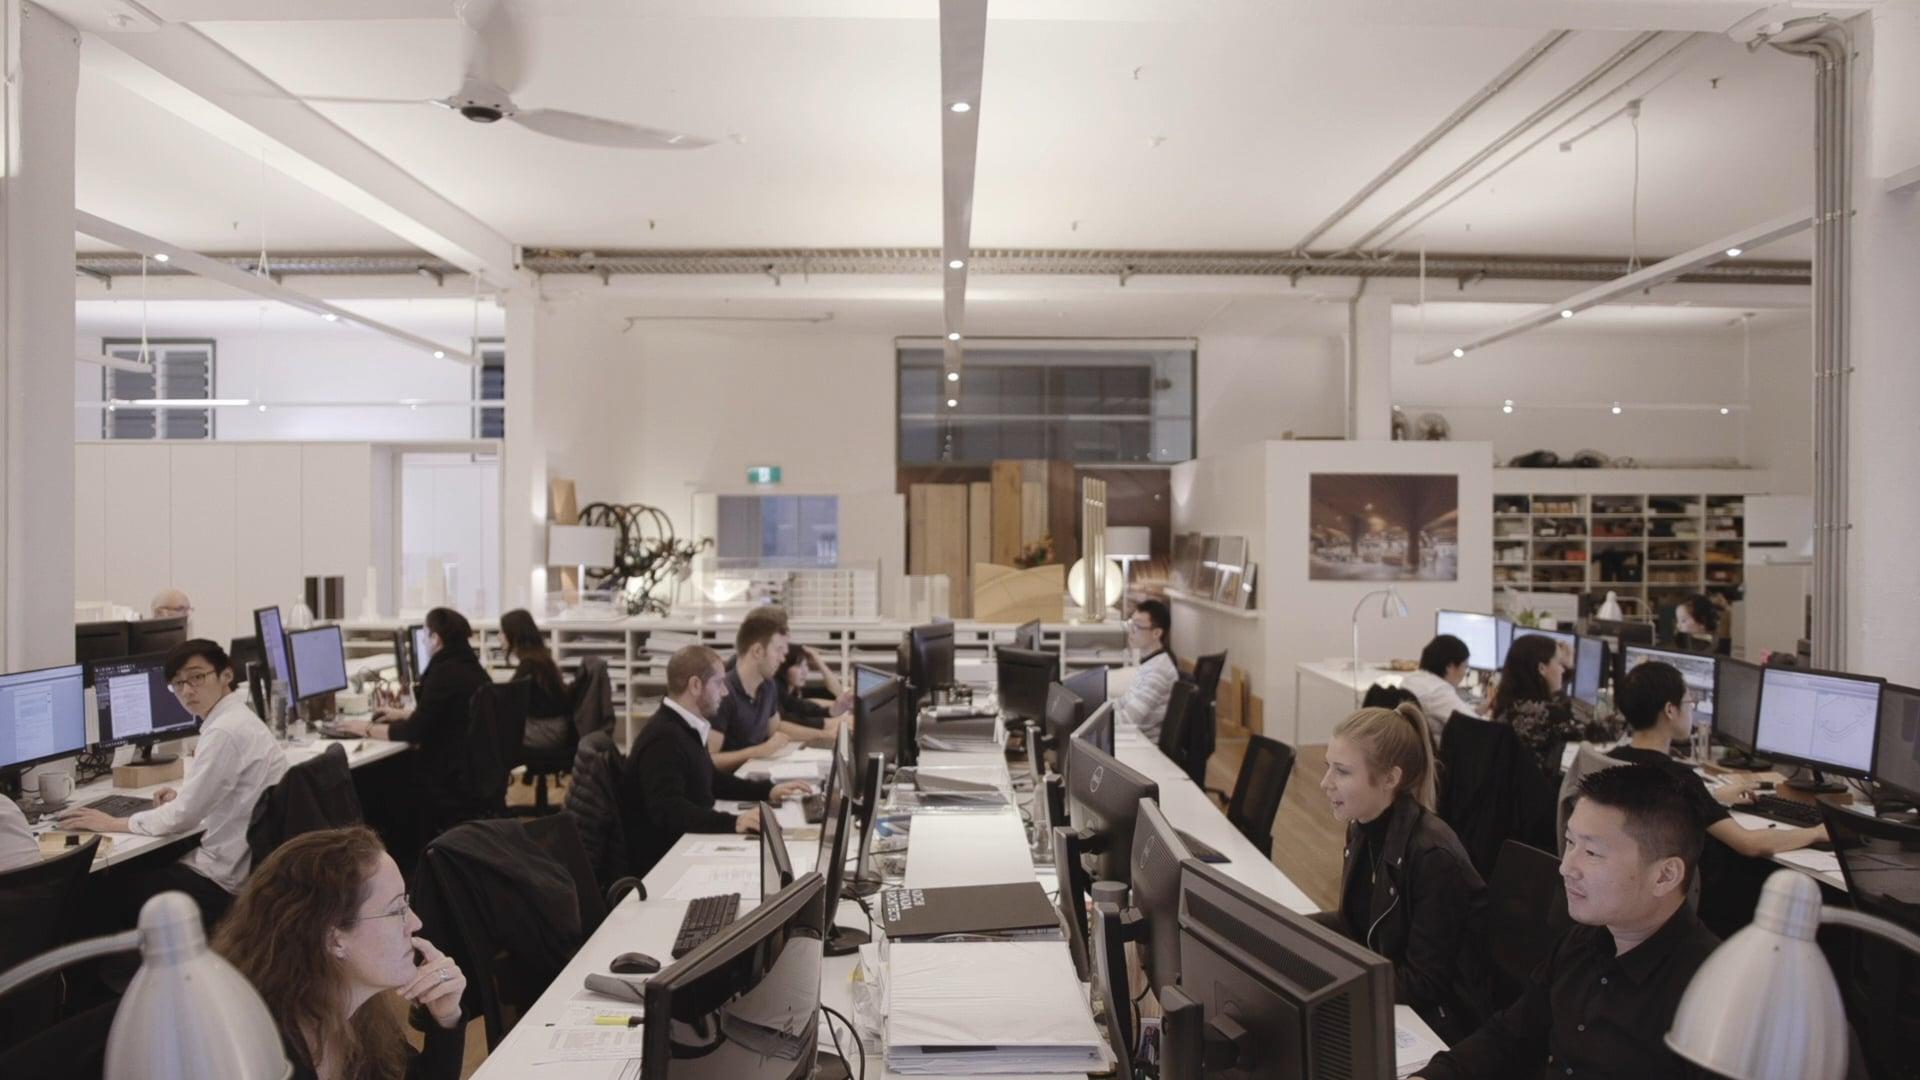 Koichi Takada Architects - 10 Years